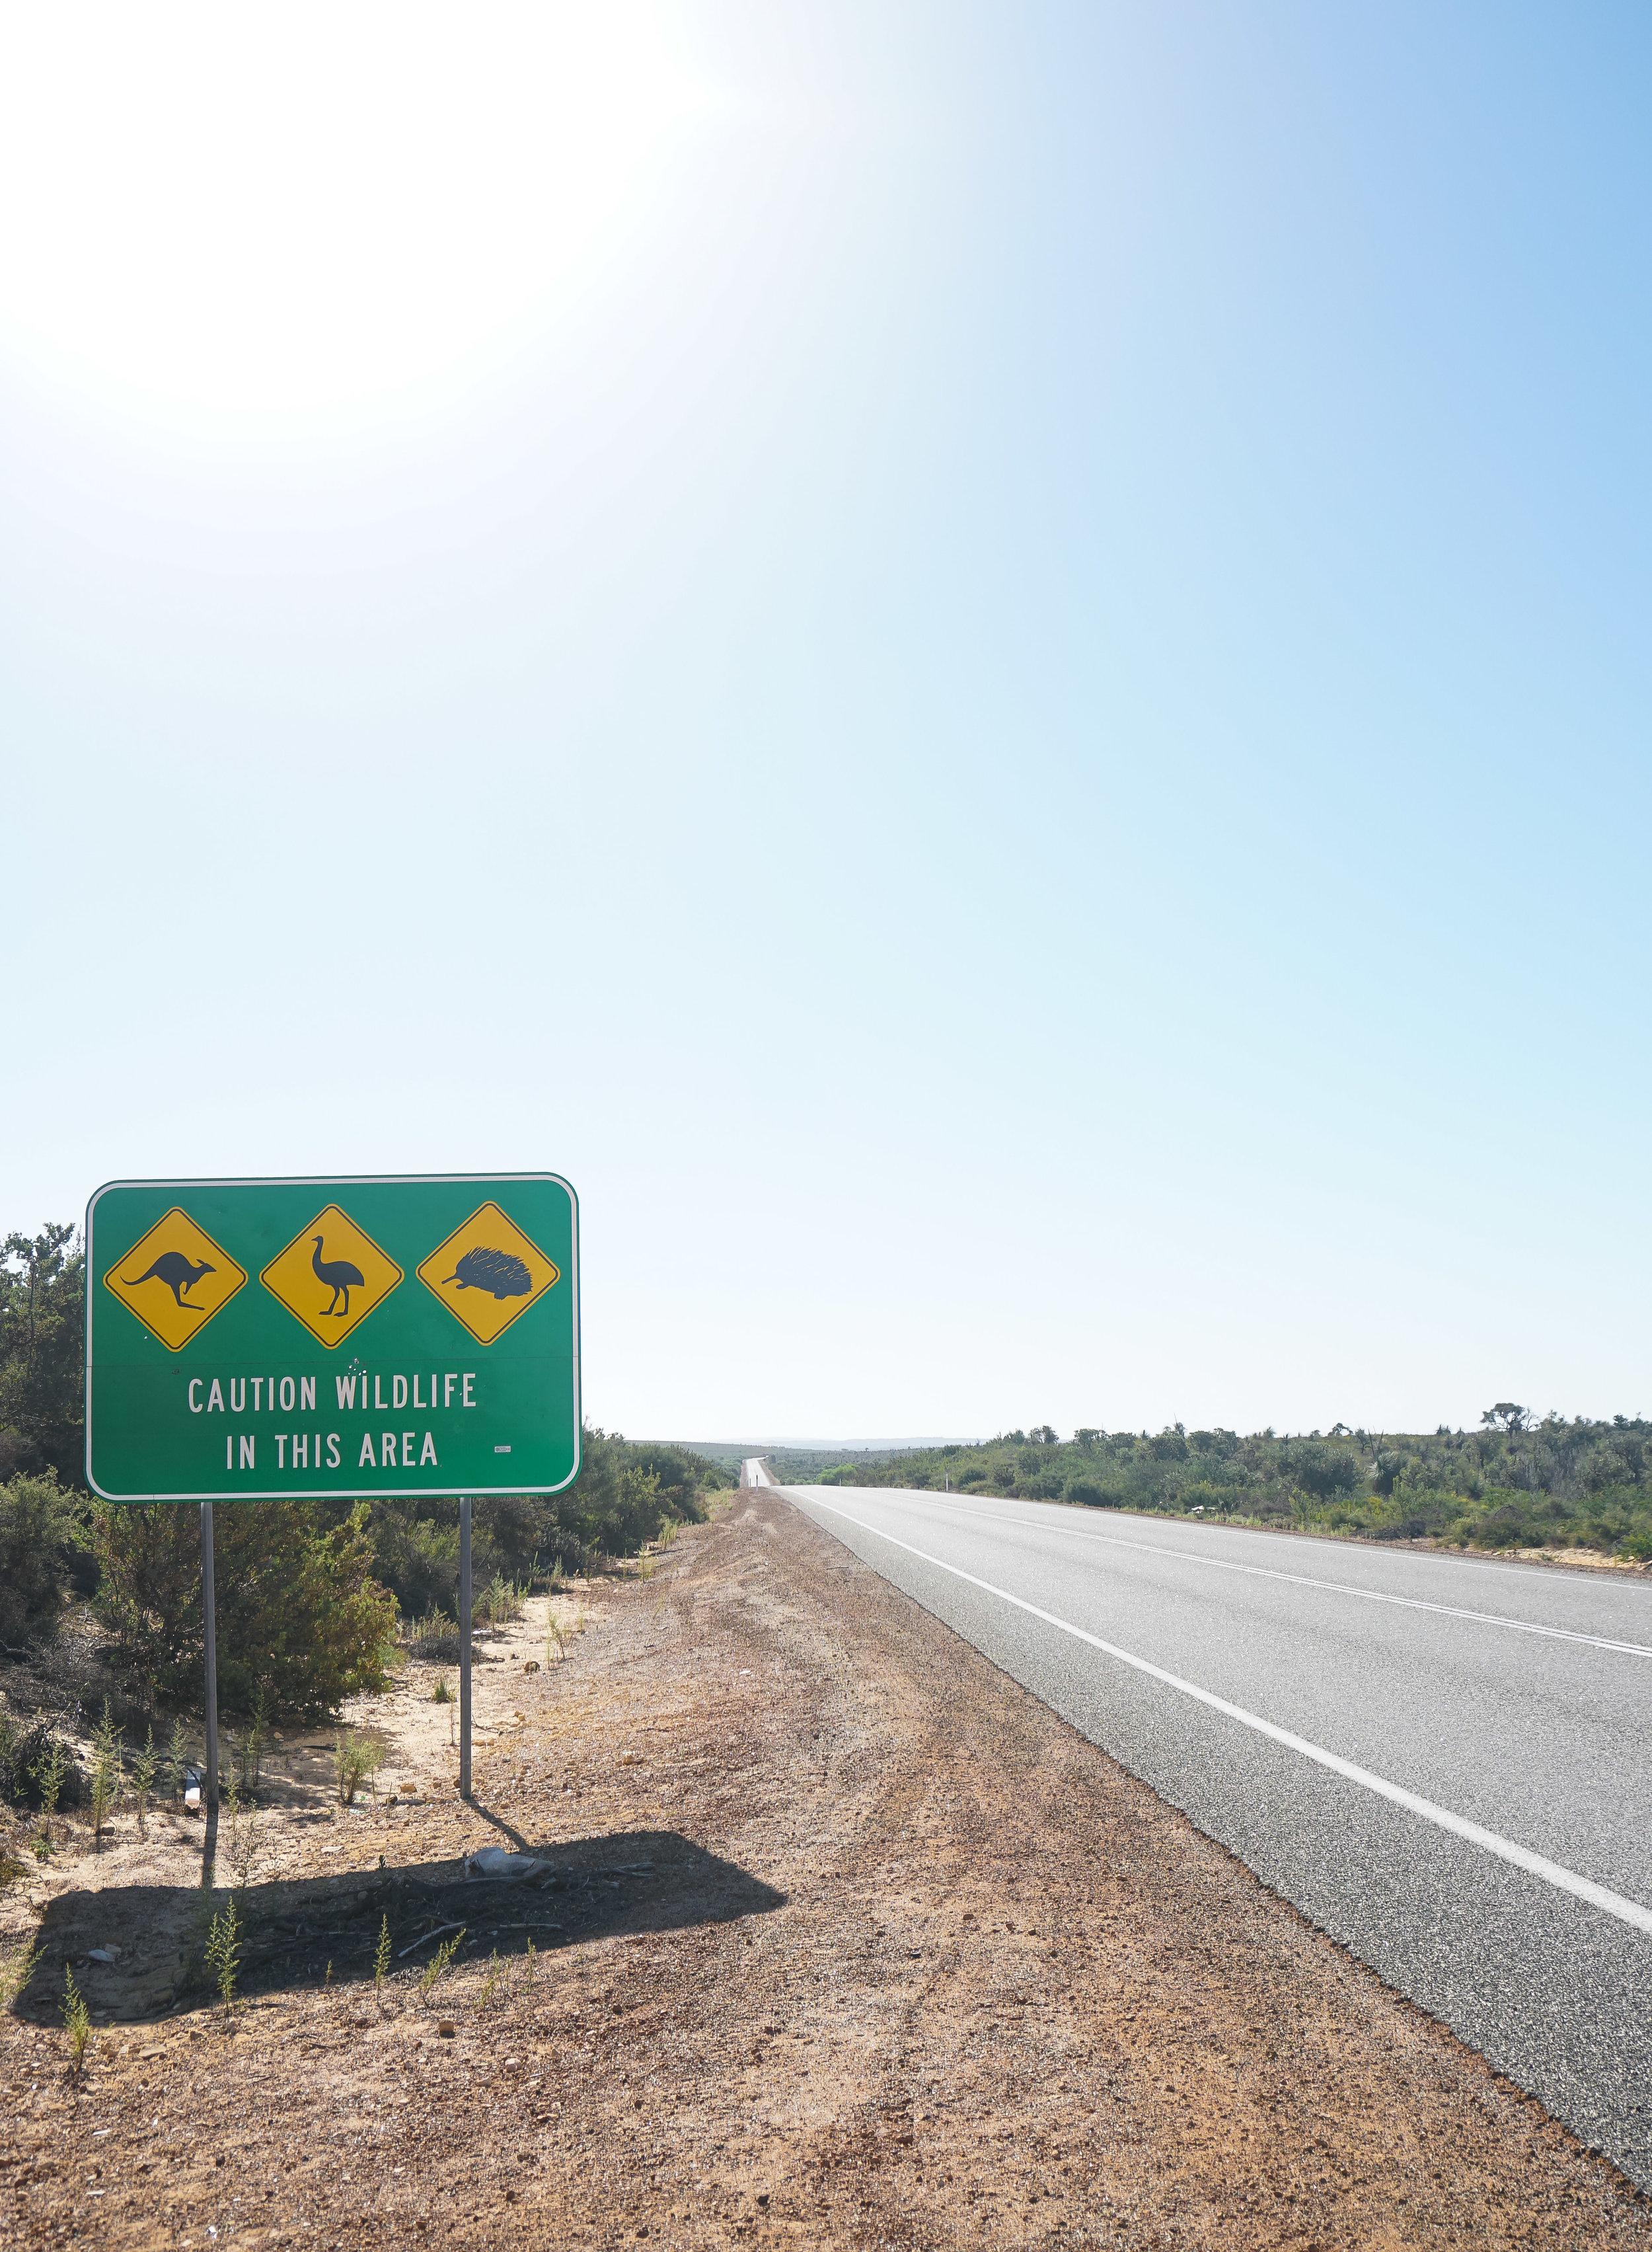 curio.trips.australia.wildlife.sign.road.portrait.jpg